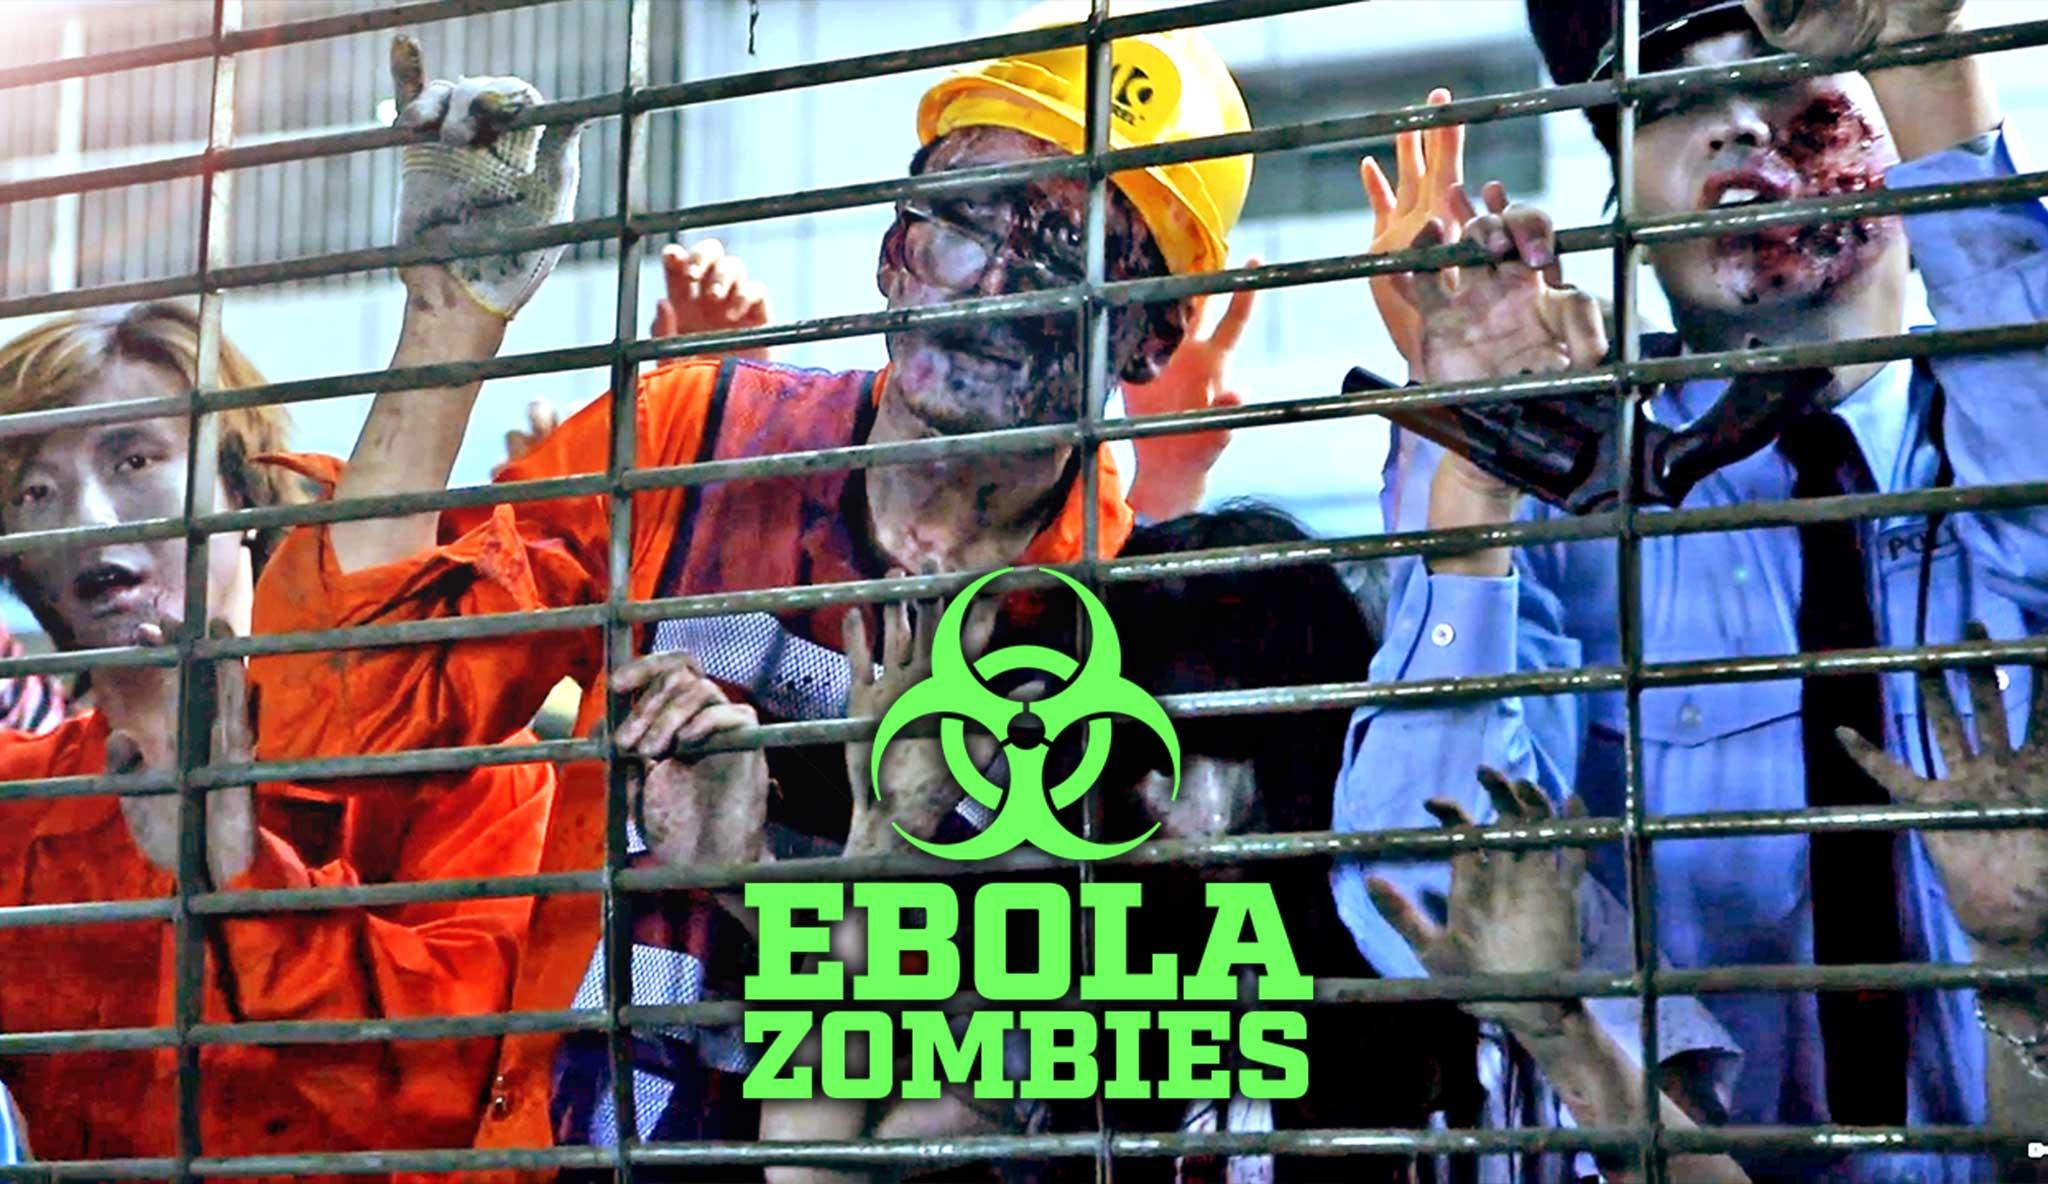 ebola-zombies\header.jpg